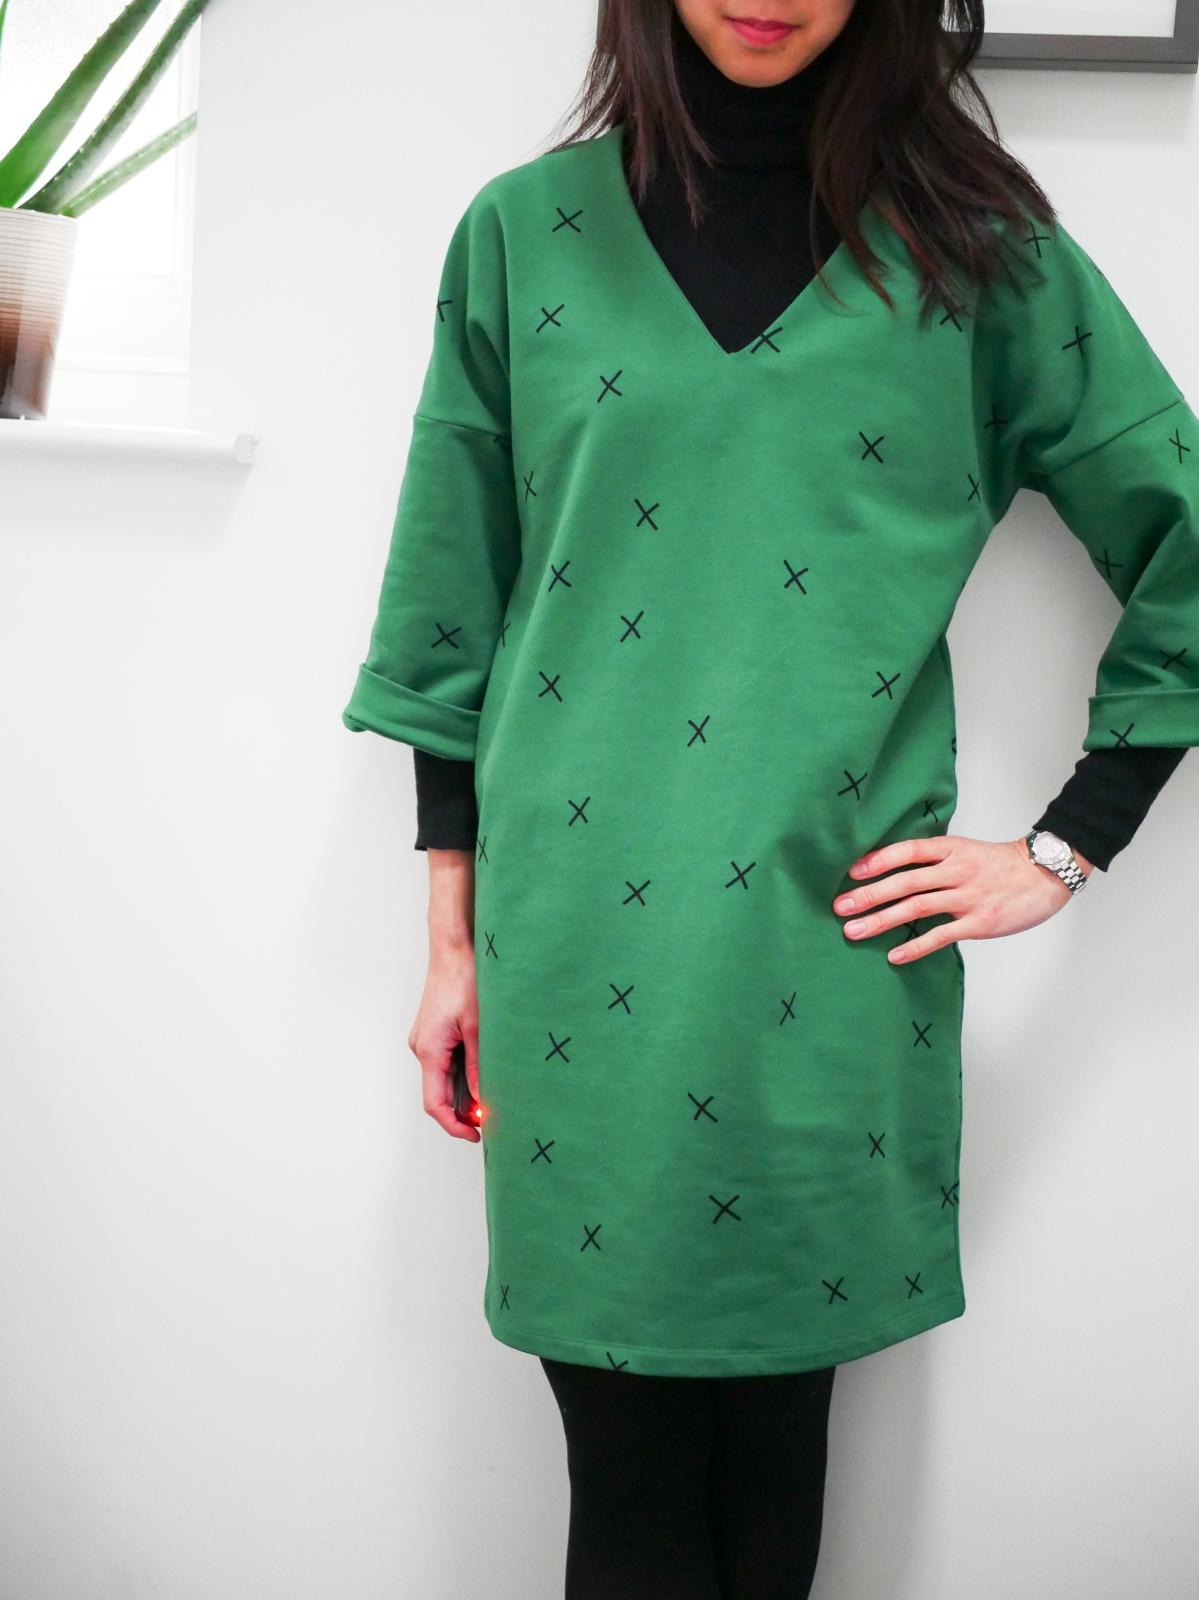 Green sweater dress